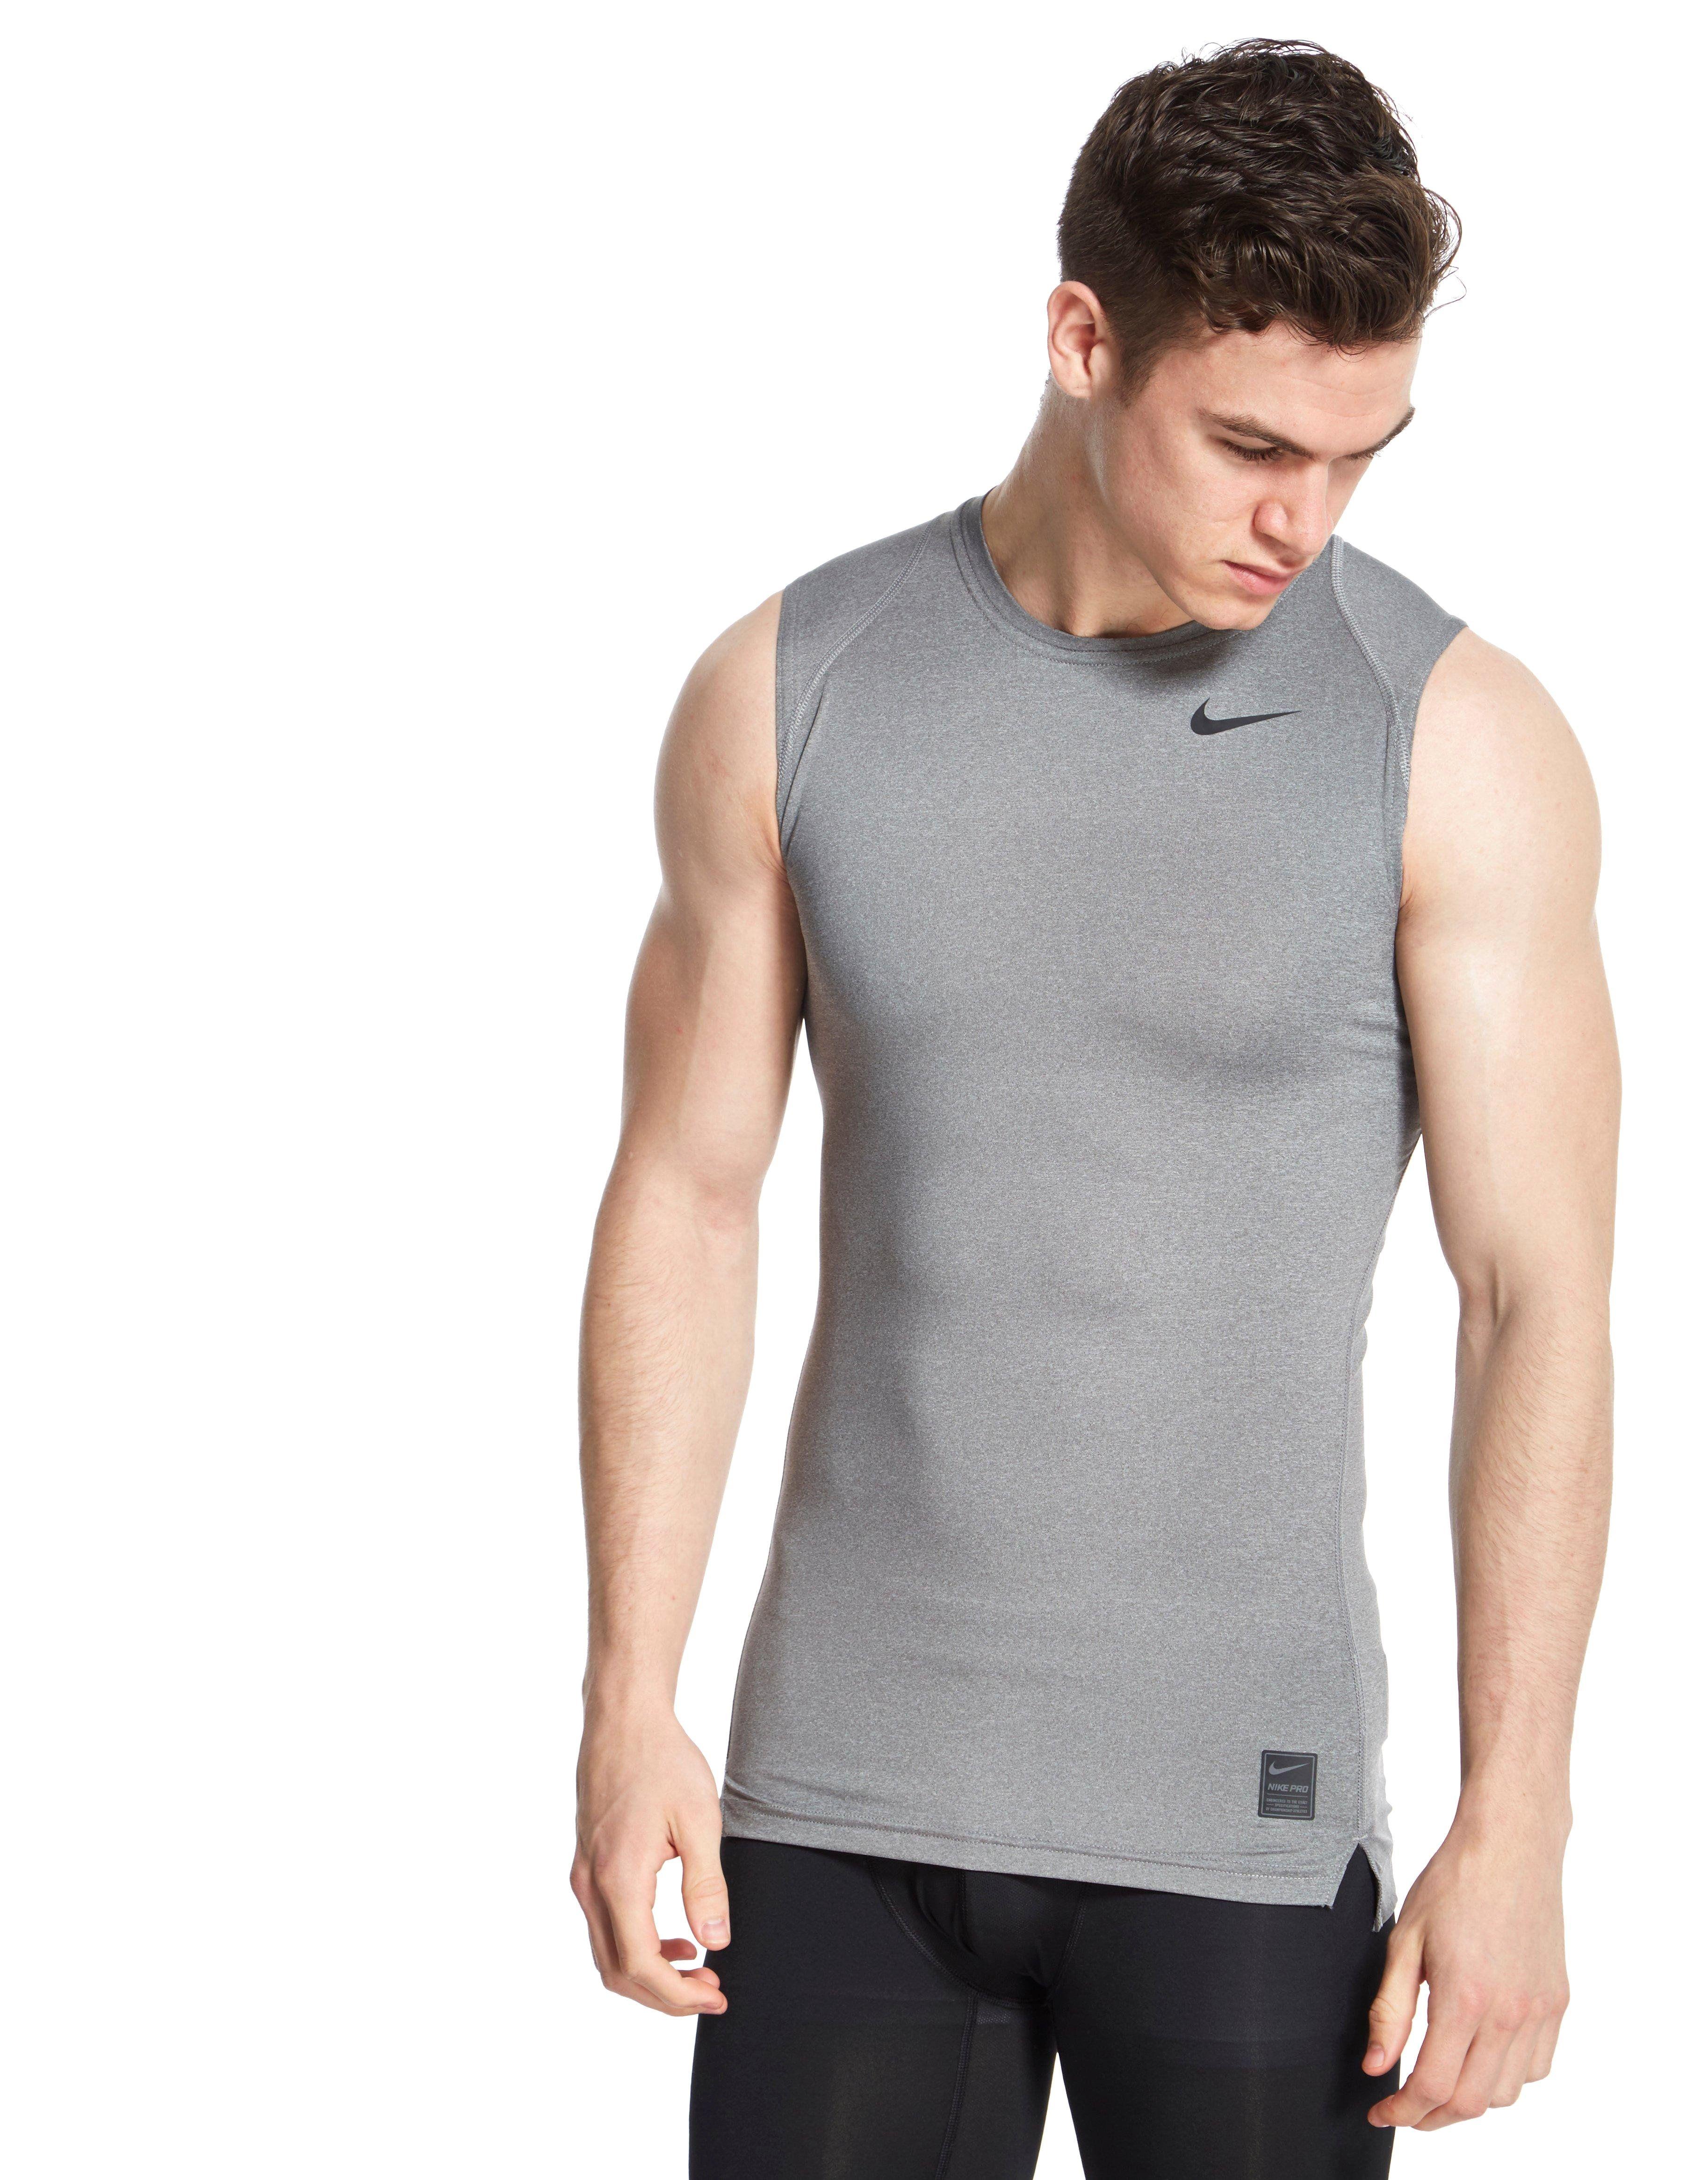 458a8cb28d28 Nike Logo Shirt Mens Sleeveless Shirt – EDGE Engineering and ...